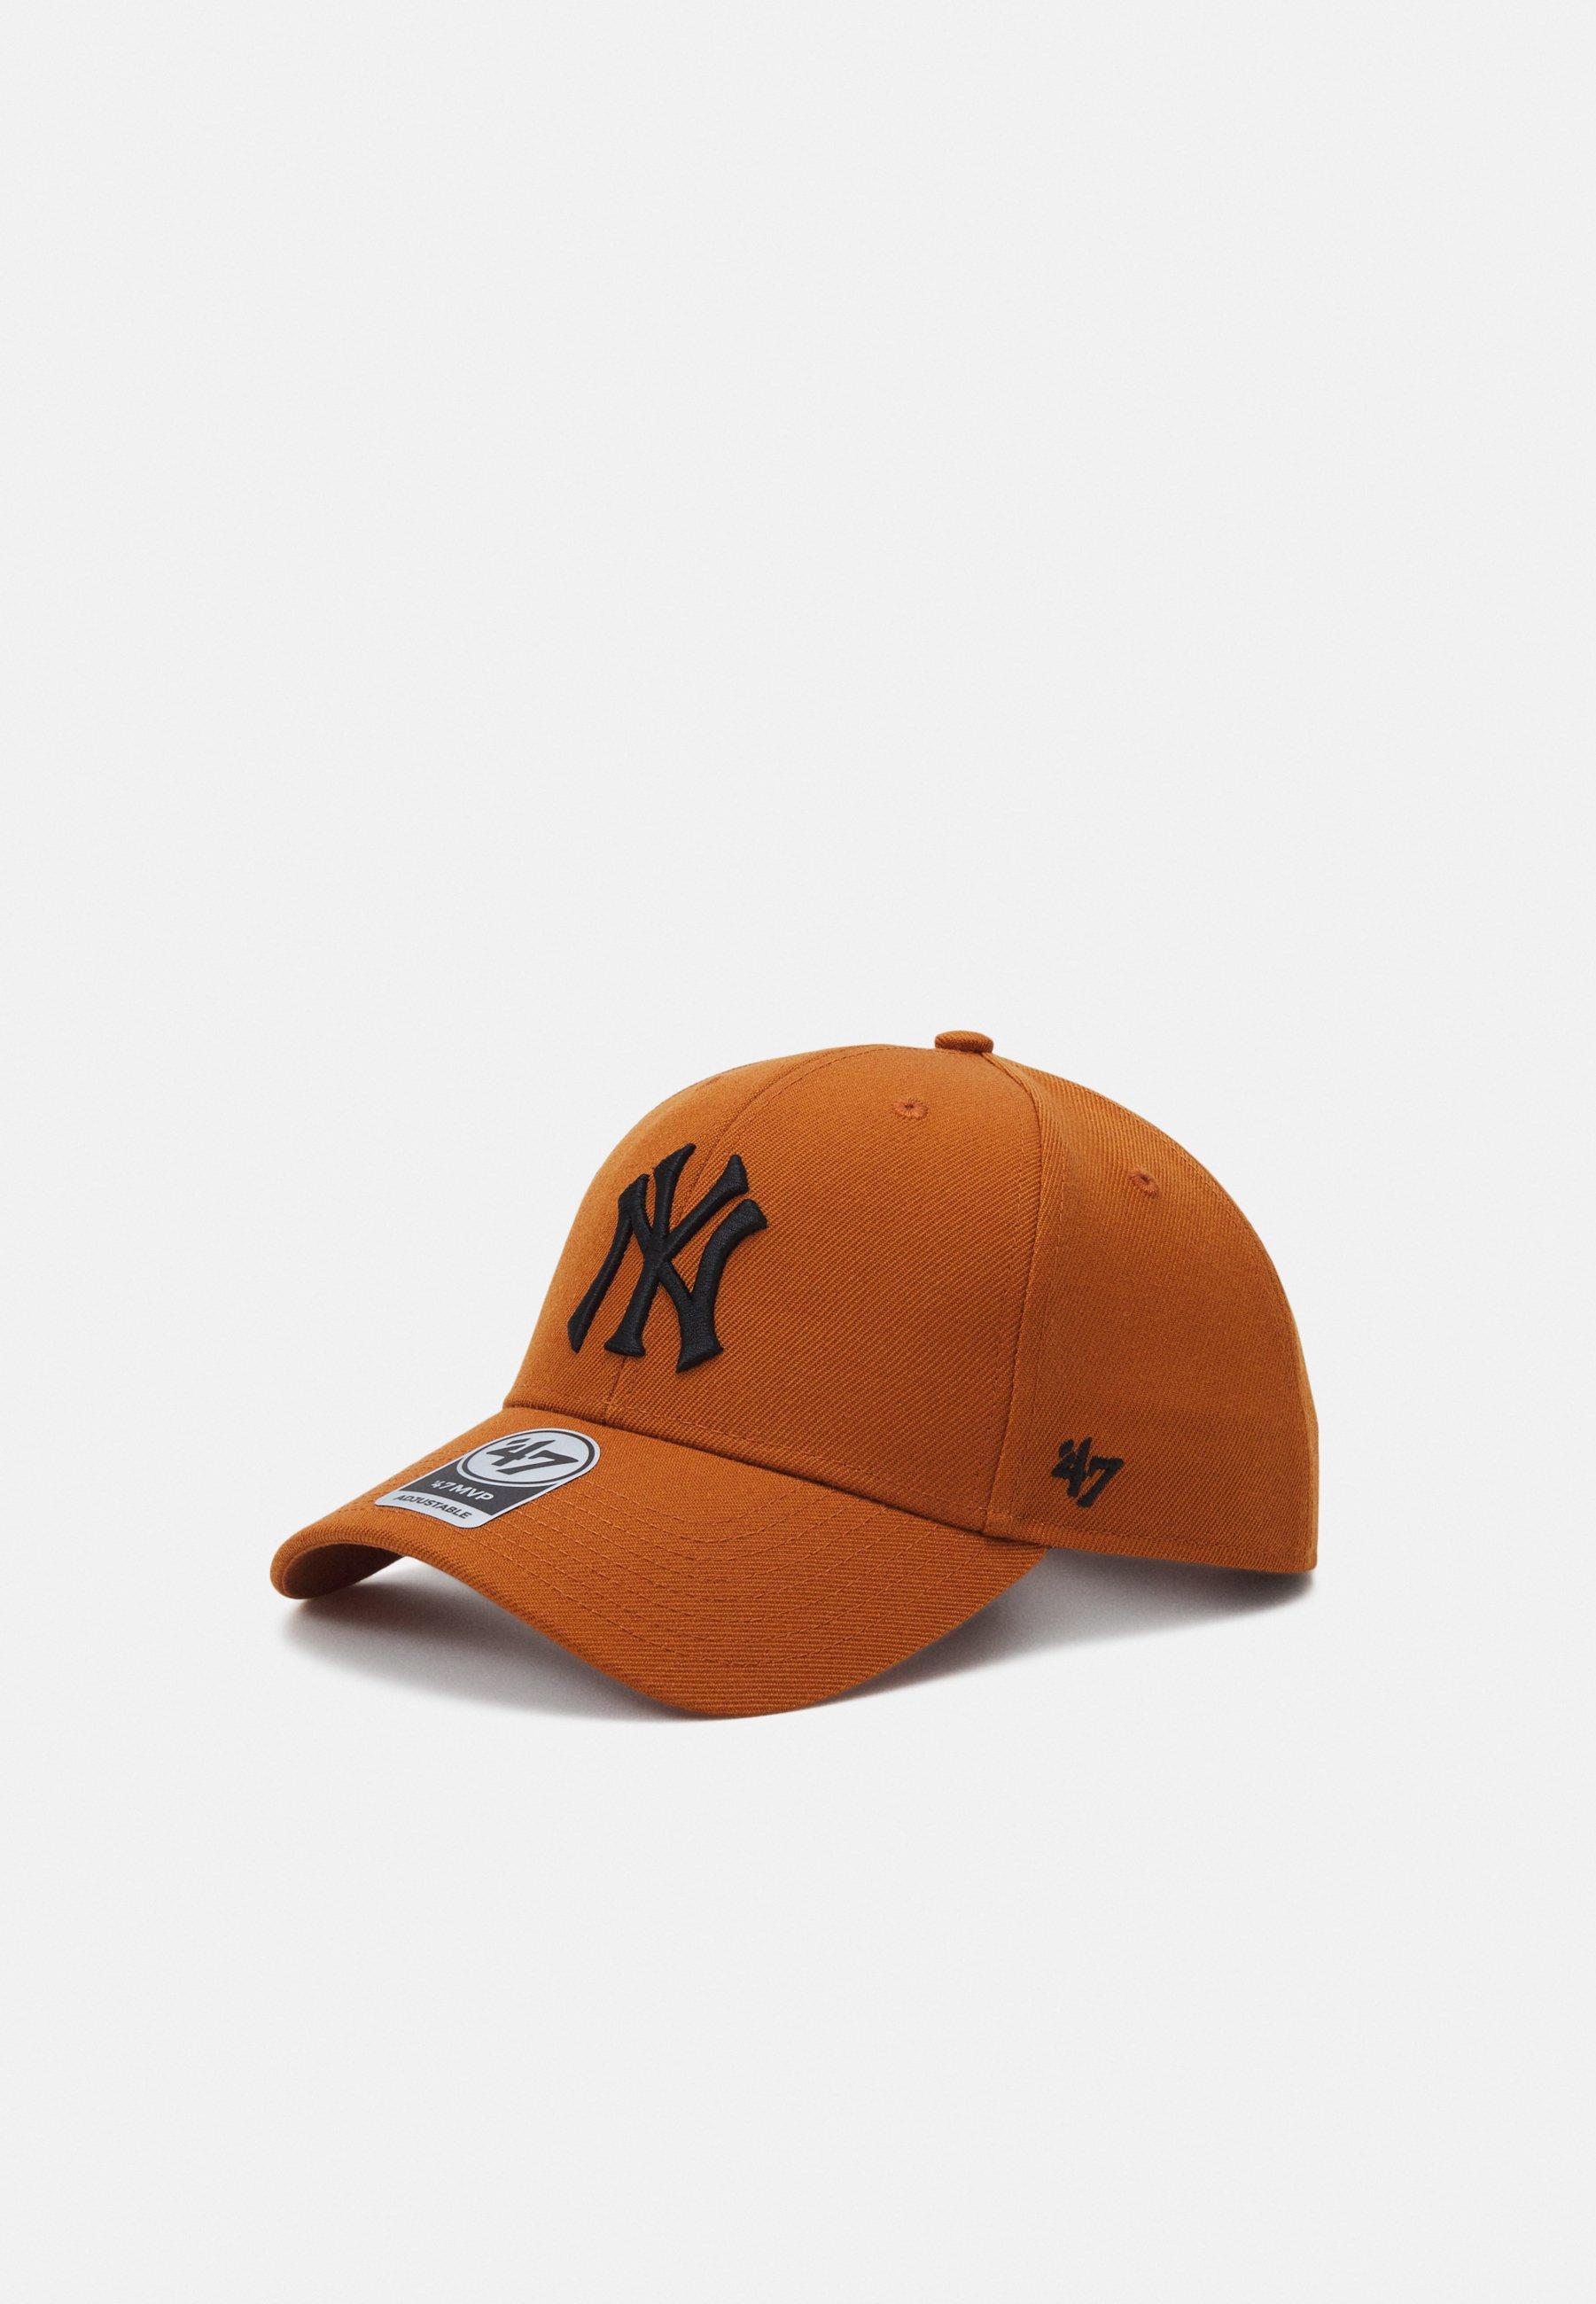 Homme MLB NEW YORK YANKEES '47 SNAPBACK UNISEX - Casquette